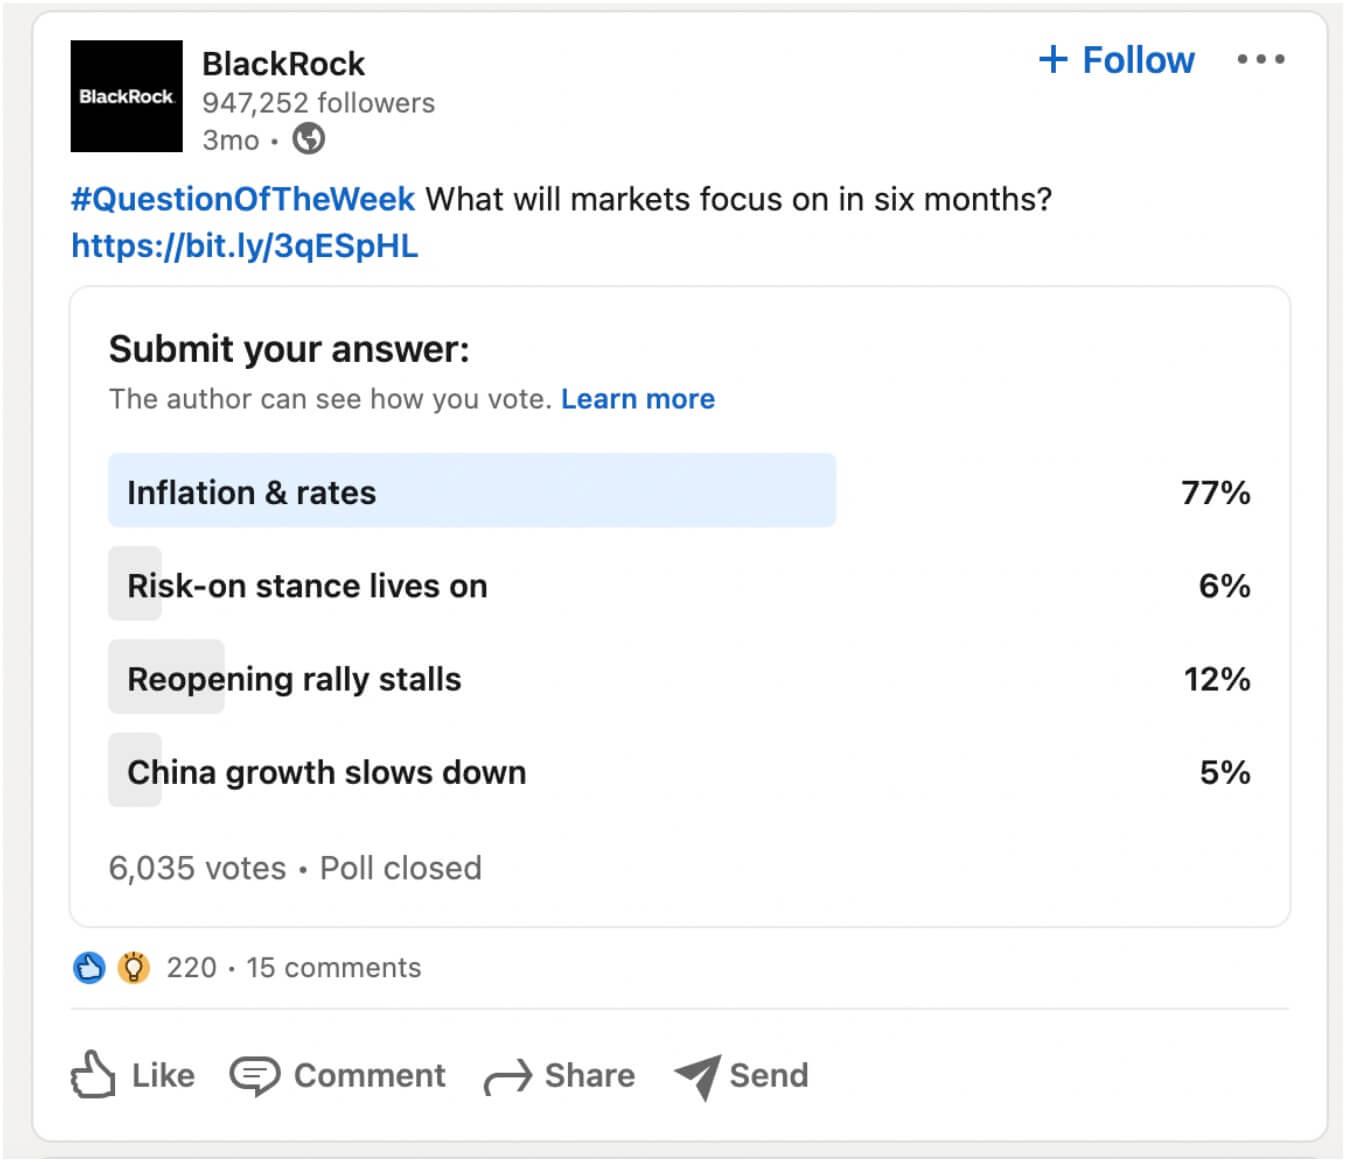 Linkedin in content marketing